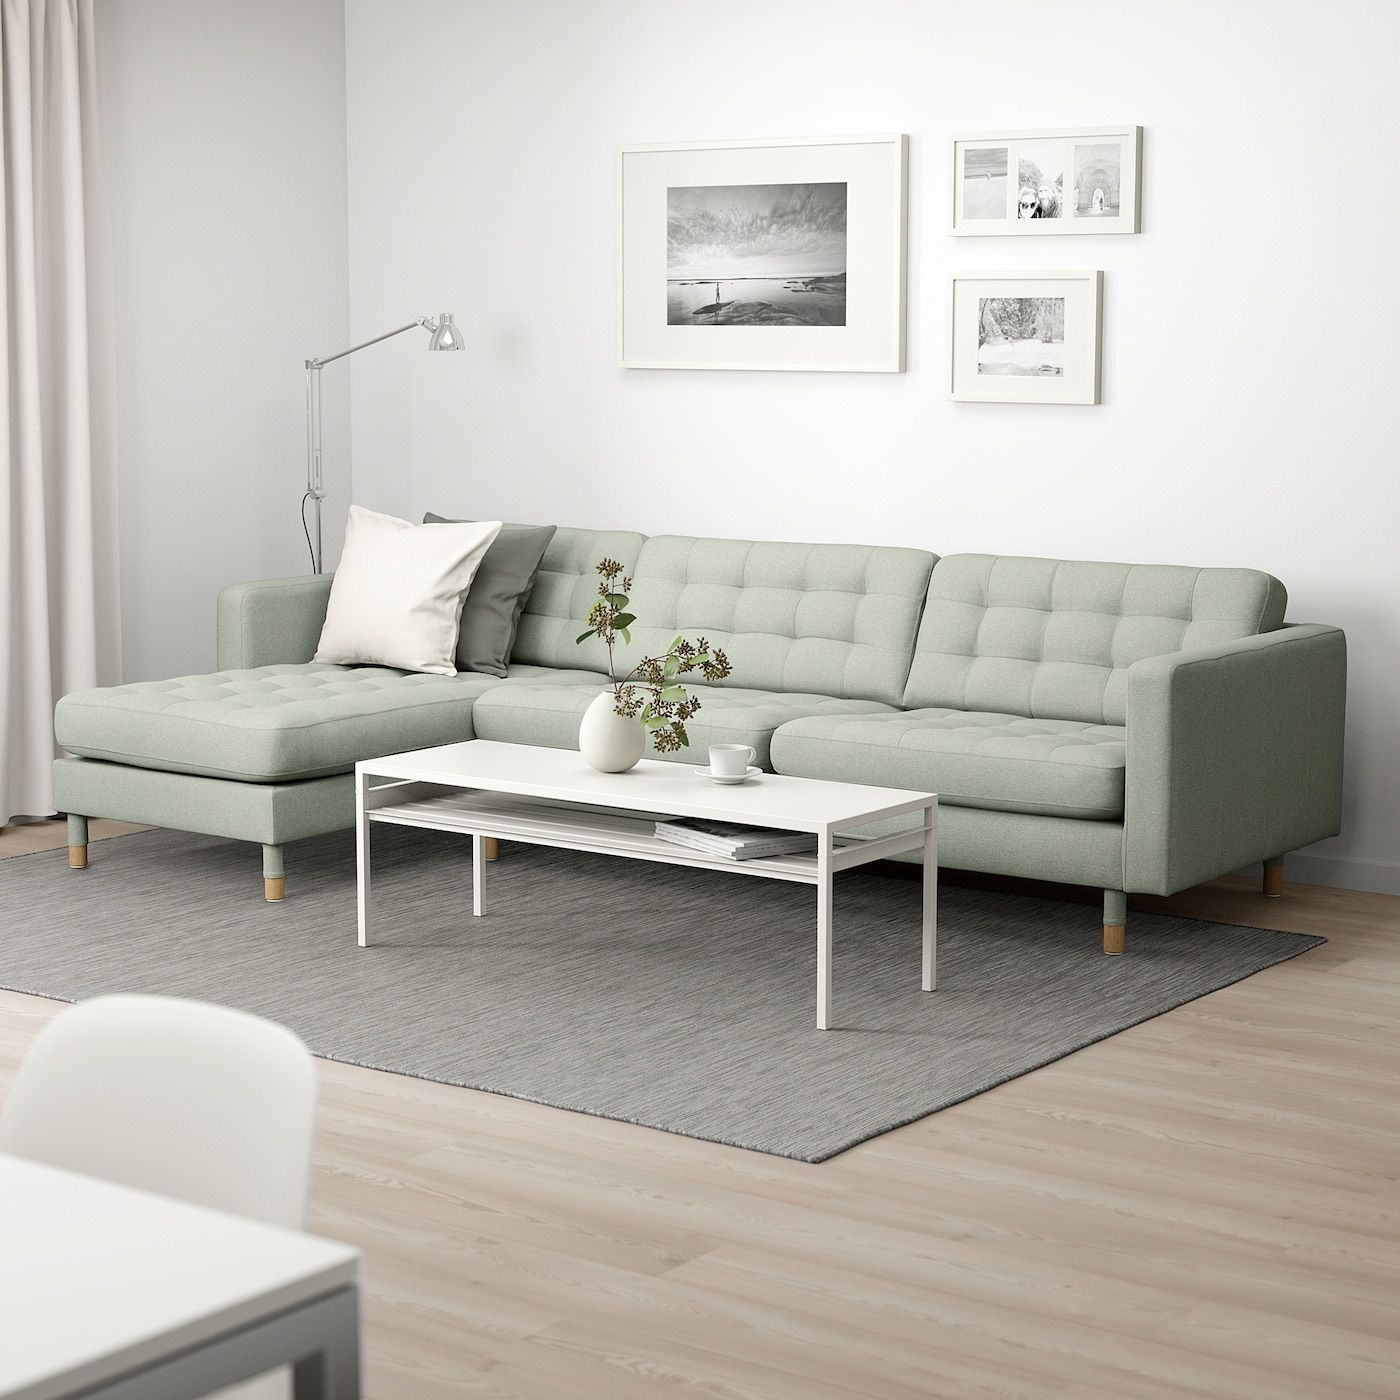 LANDSKRONA 4er Sofa mit Récamiere, Gunnared hellgrünHolz